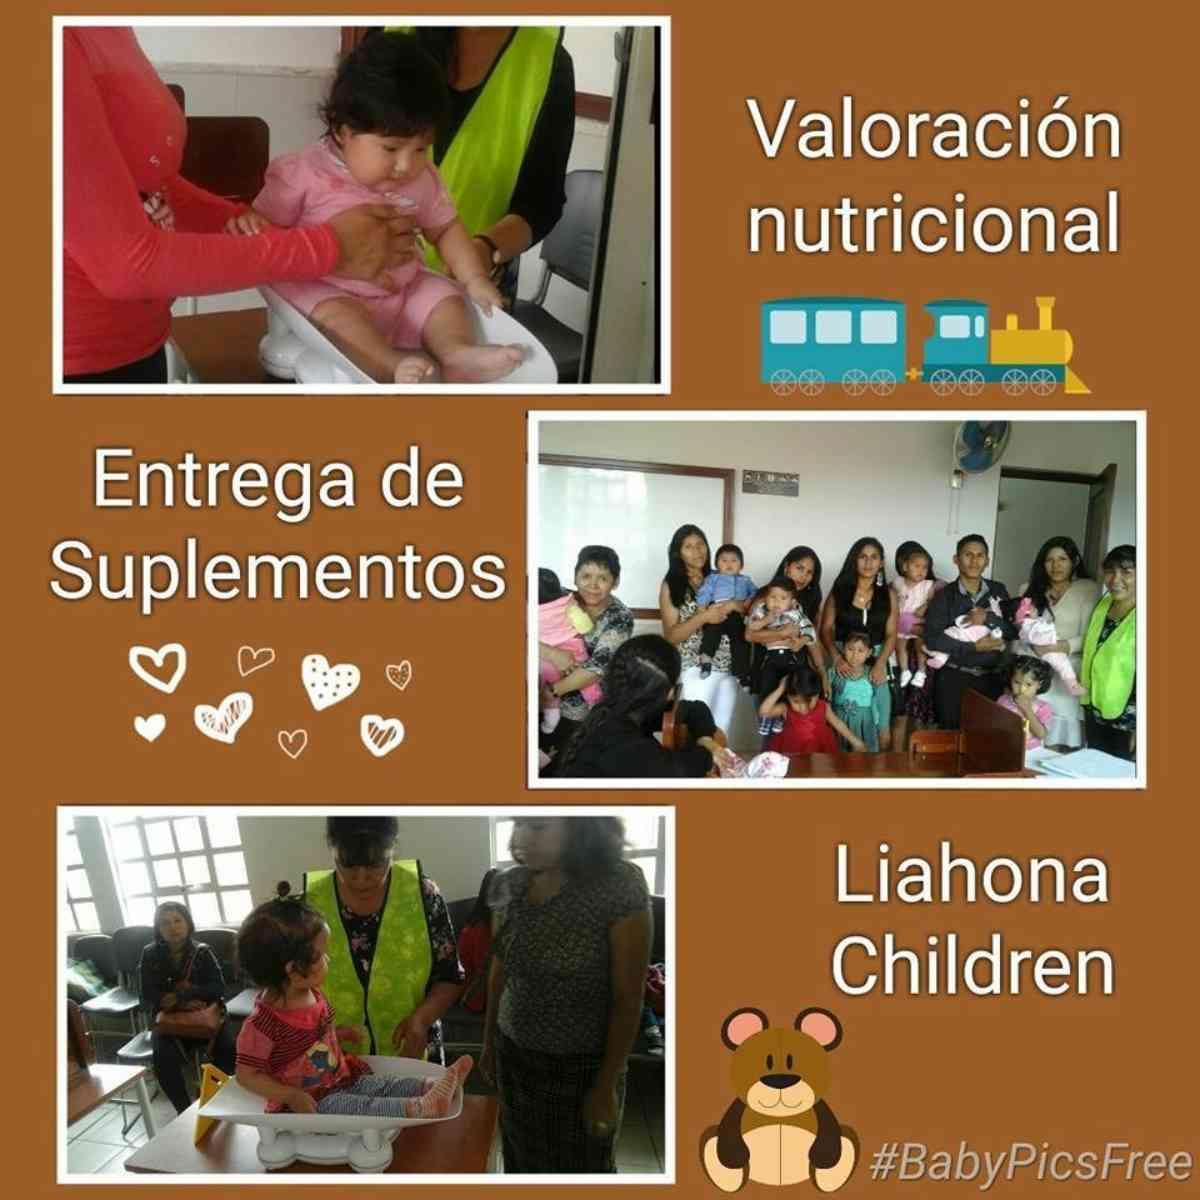 Oruro Distribution 3 10 17 1